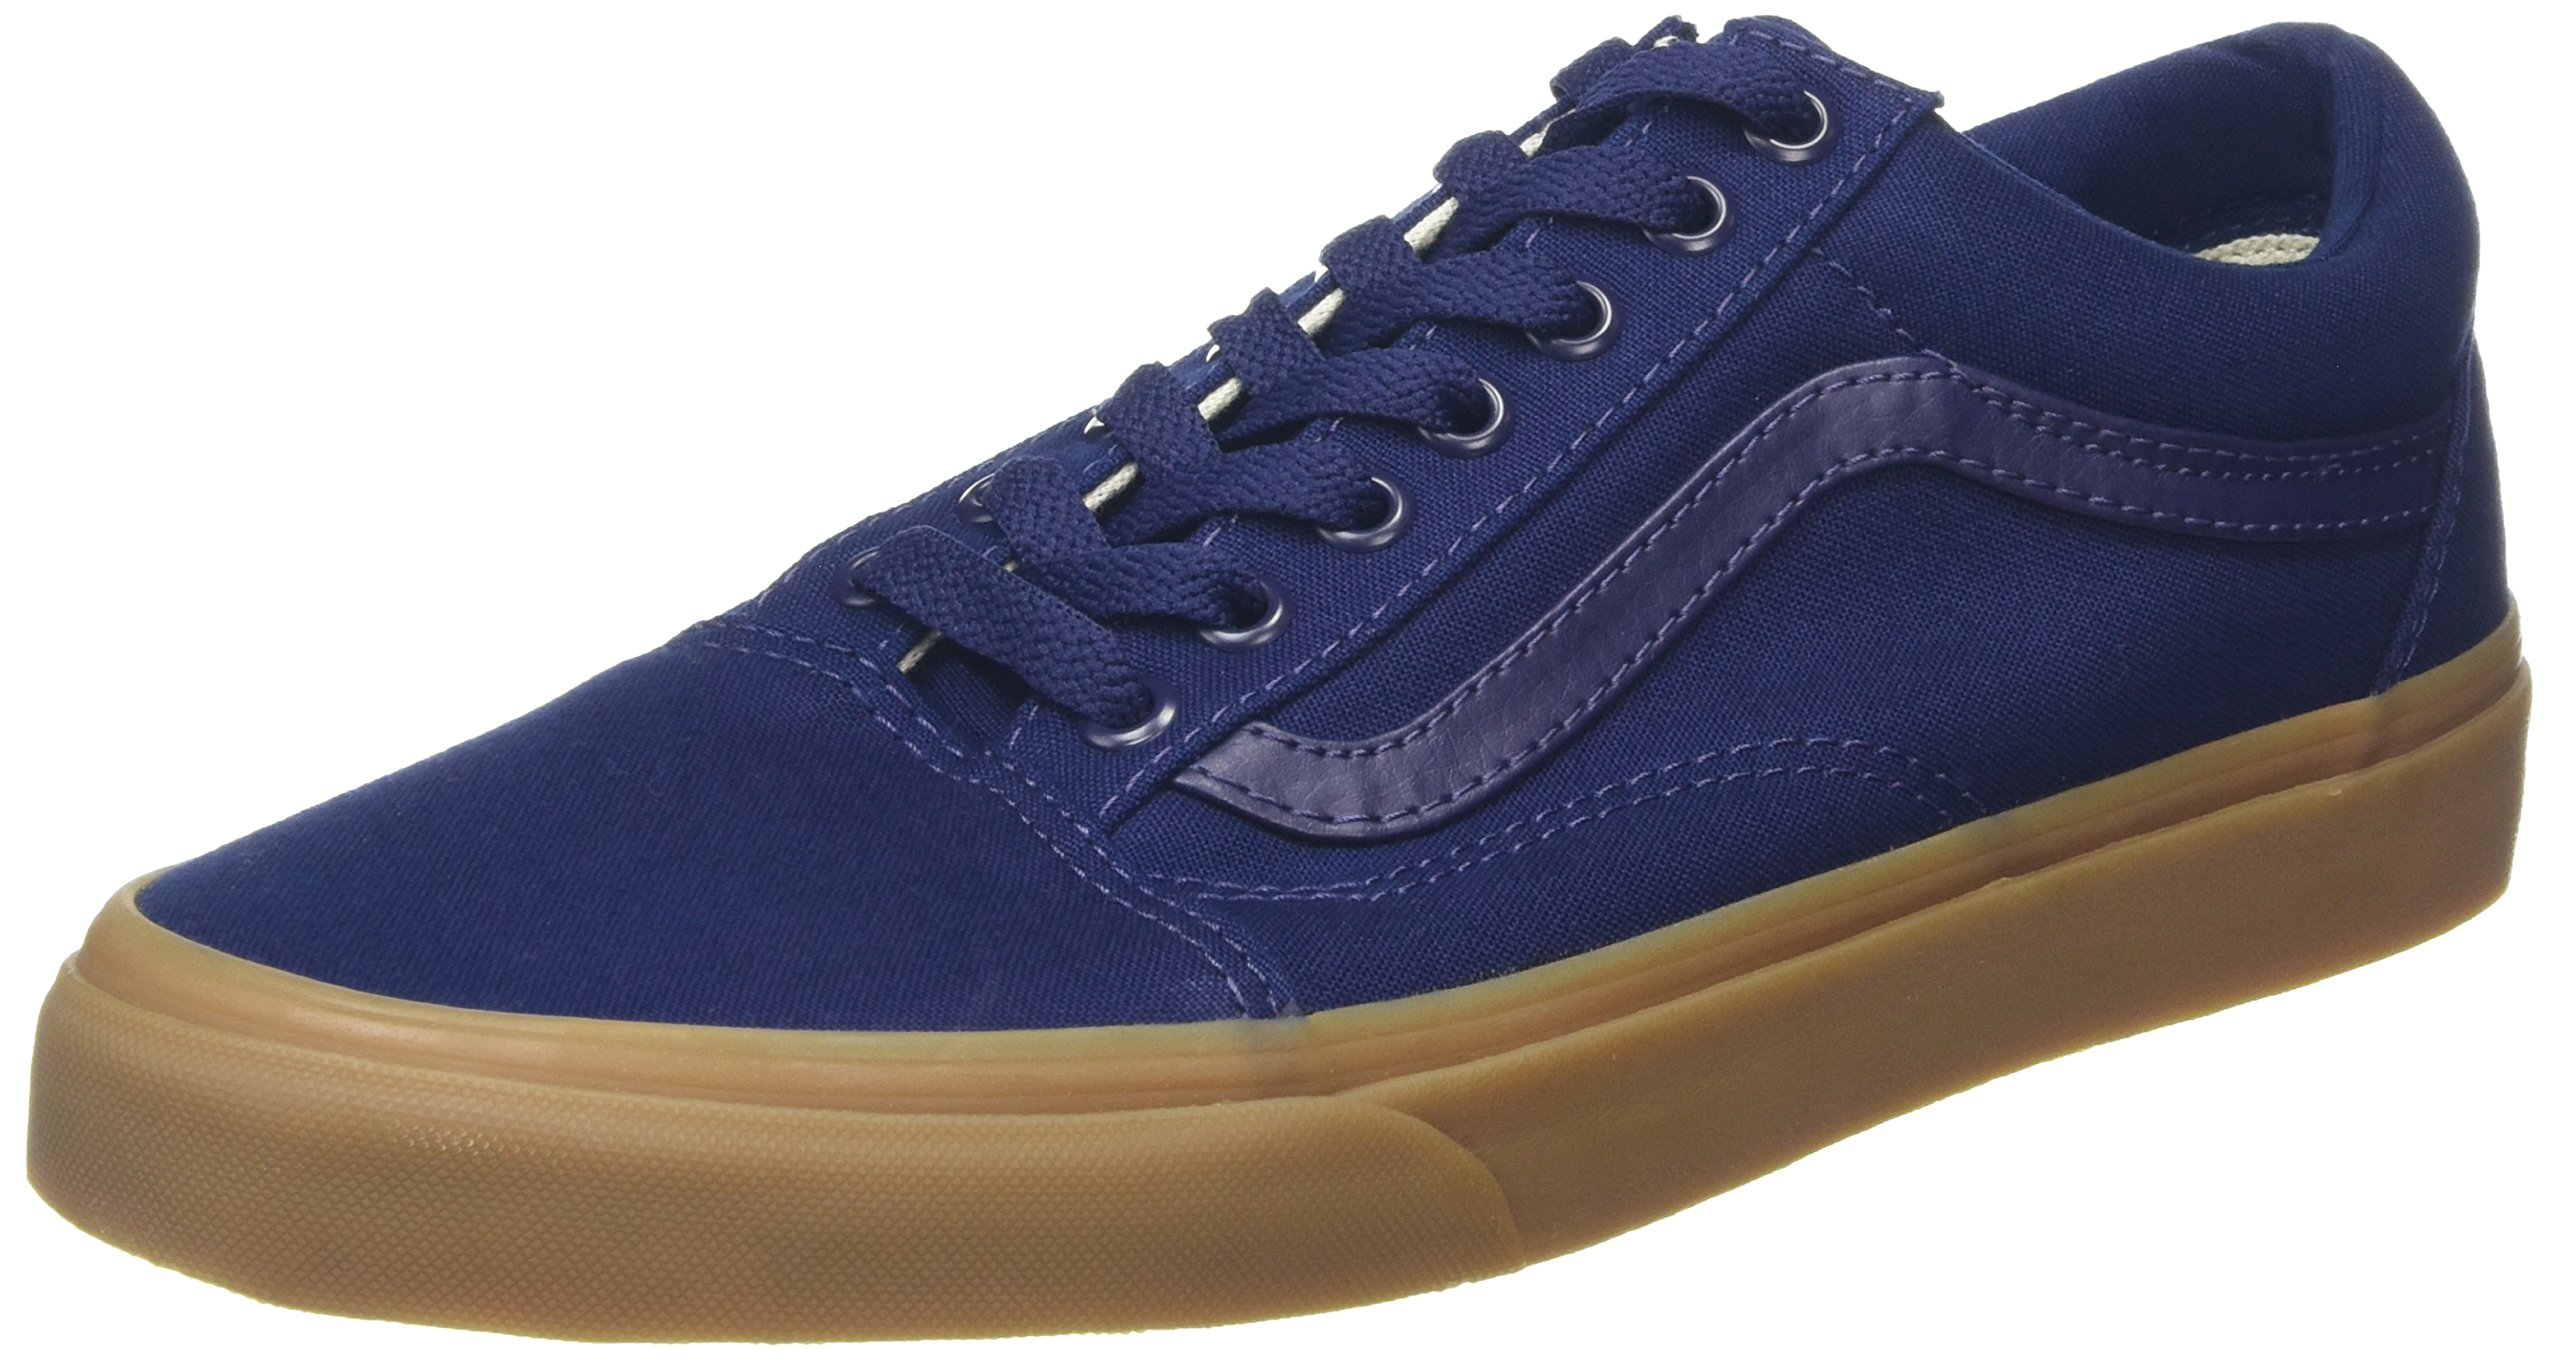 vans unisex adults old skool low top sneakers blue canvas. Black Bedroom Furniture Sets. Home Design Ideas